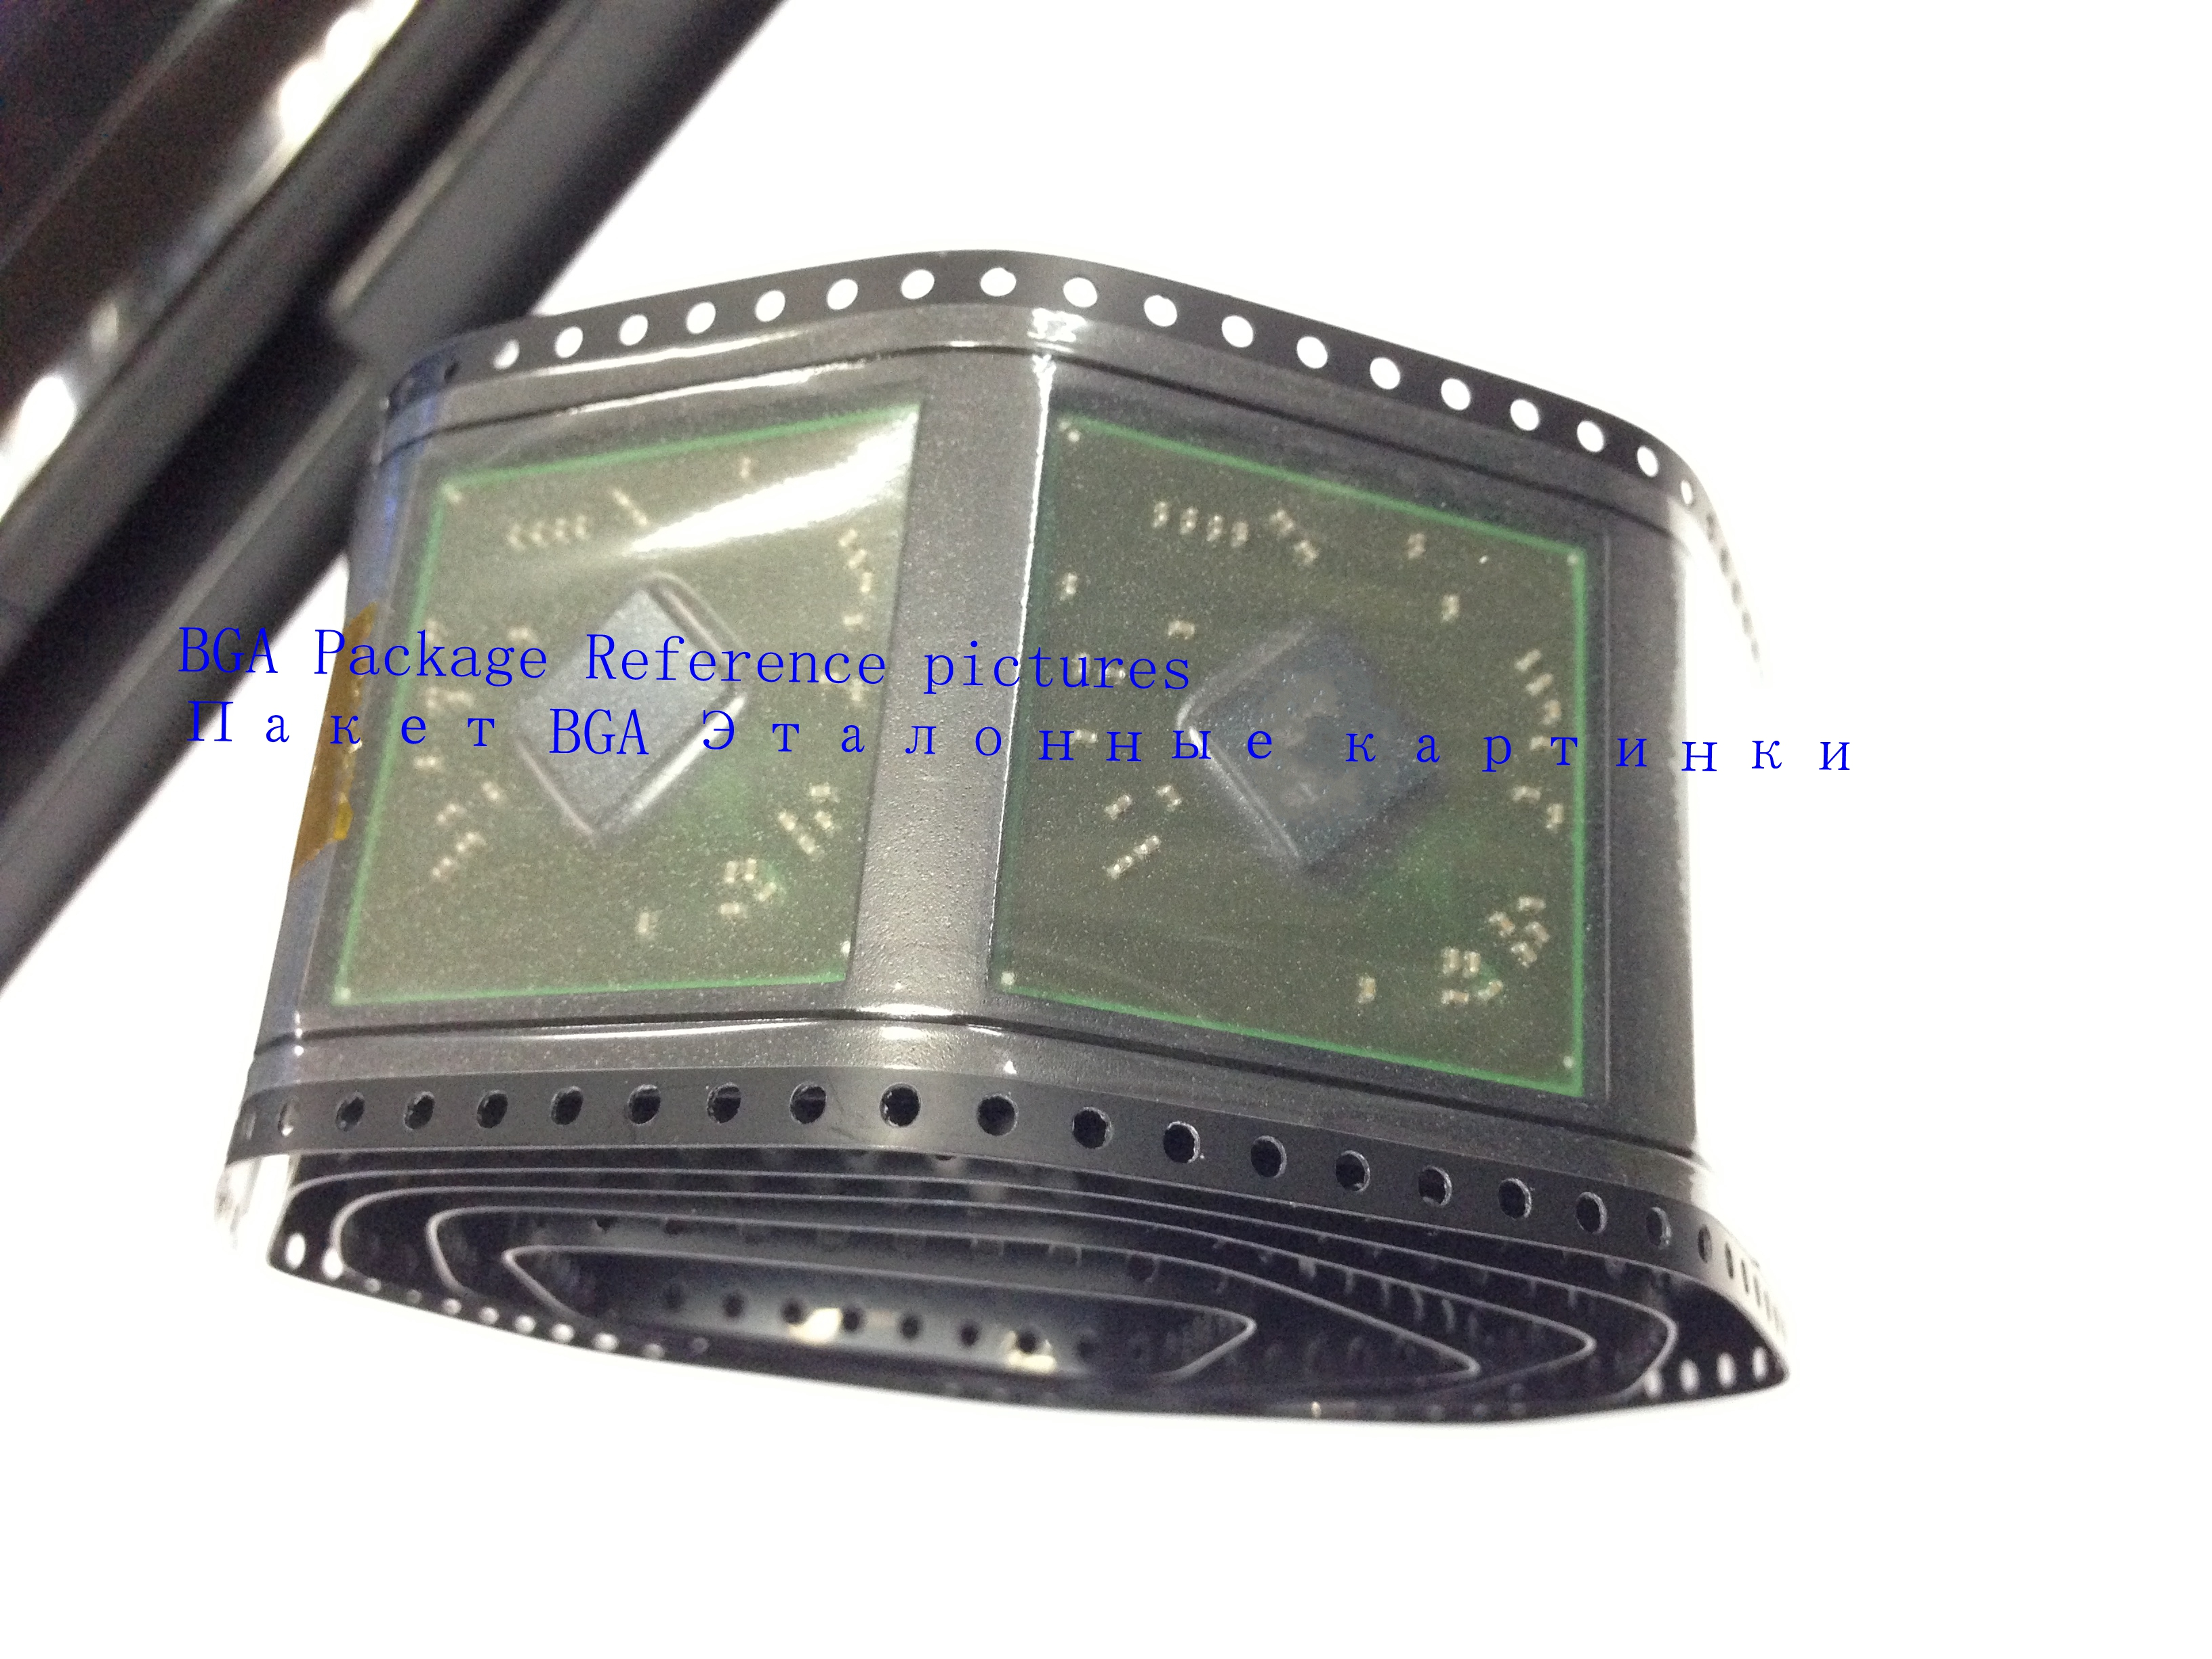 1 pz/lotto 100% Nuovo N11M-GE1-S-B1 N11M GE1 S B1 BGA Chipset1 pz/lotto 100% Nuovo N11M-GE1-S-B1 N11M GE1 S B1 BGA Chipset